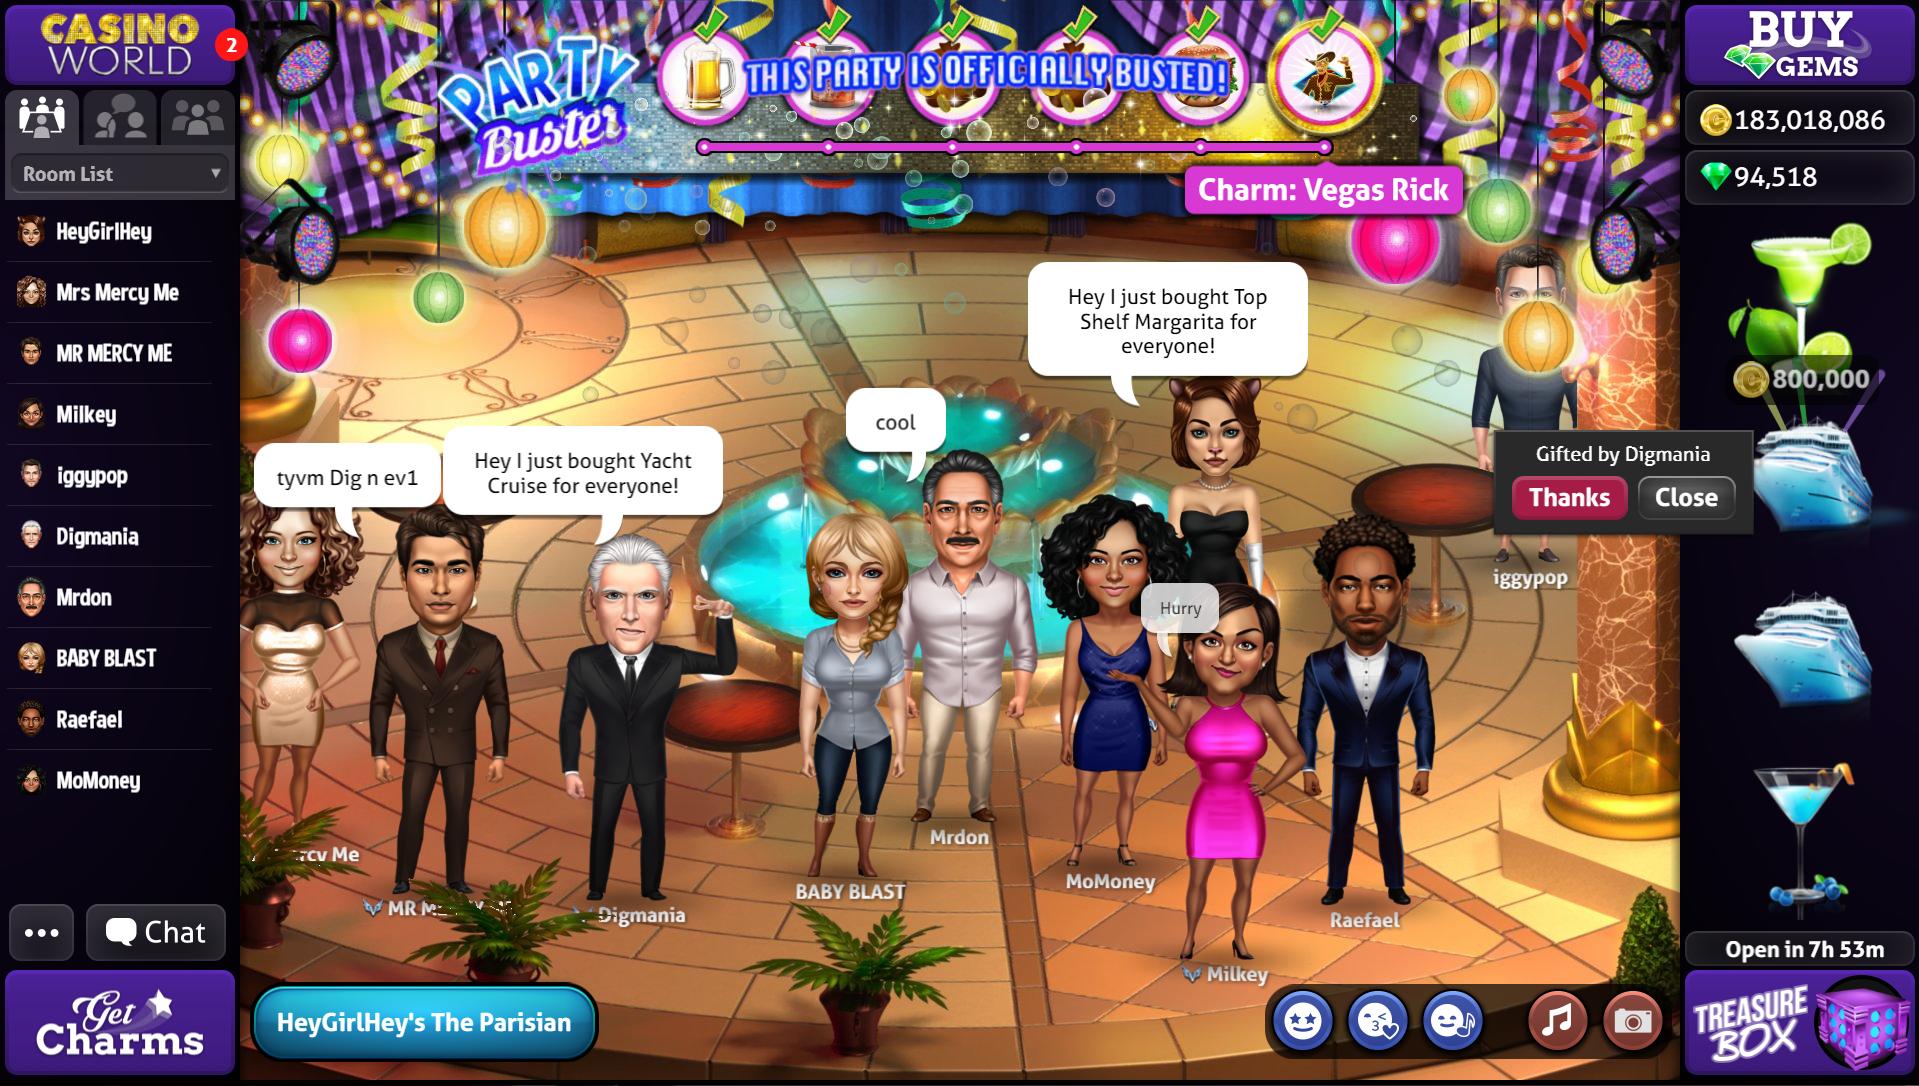 Bovada casino app